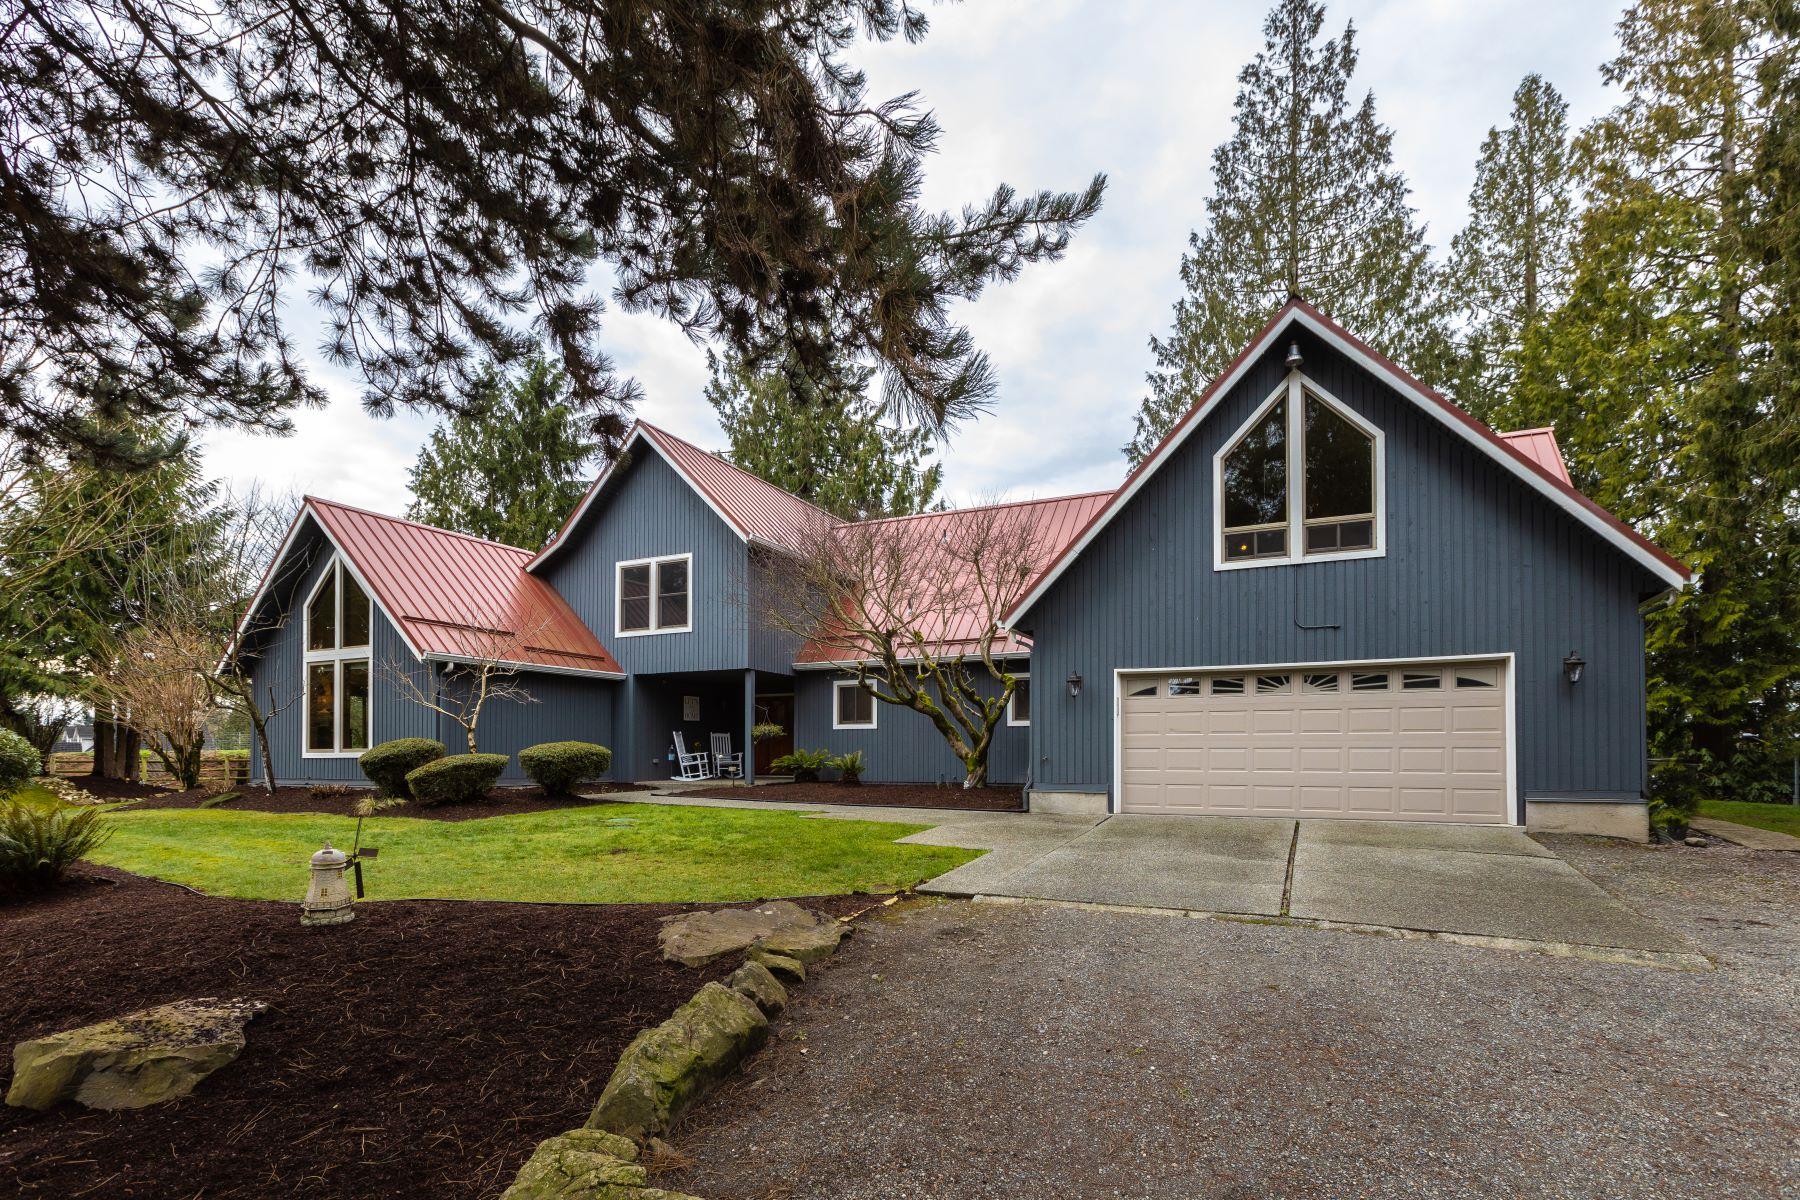 Single Family Homes for Sale at 16120 51st St SE, Snohomish, WA 98290 Snohomish, Washington 98290 United States